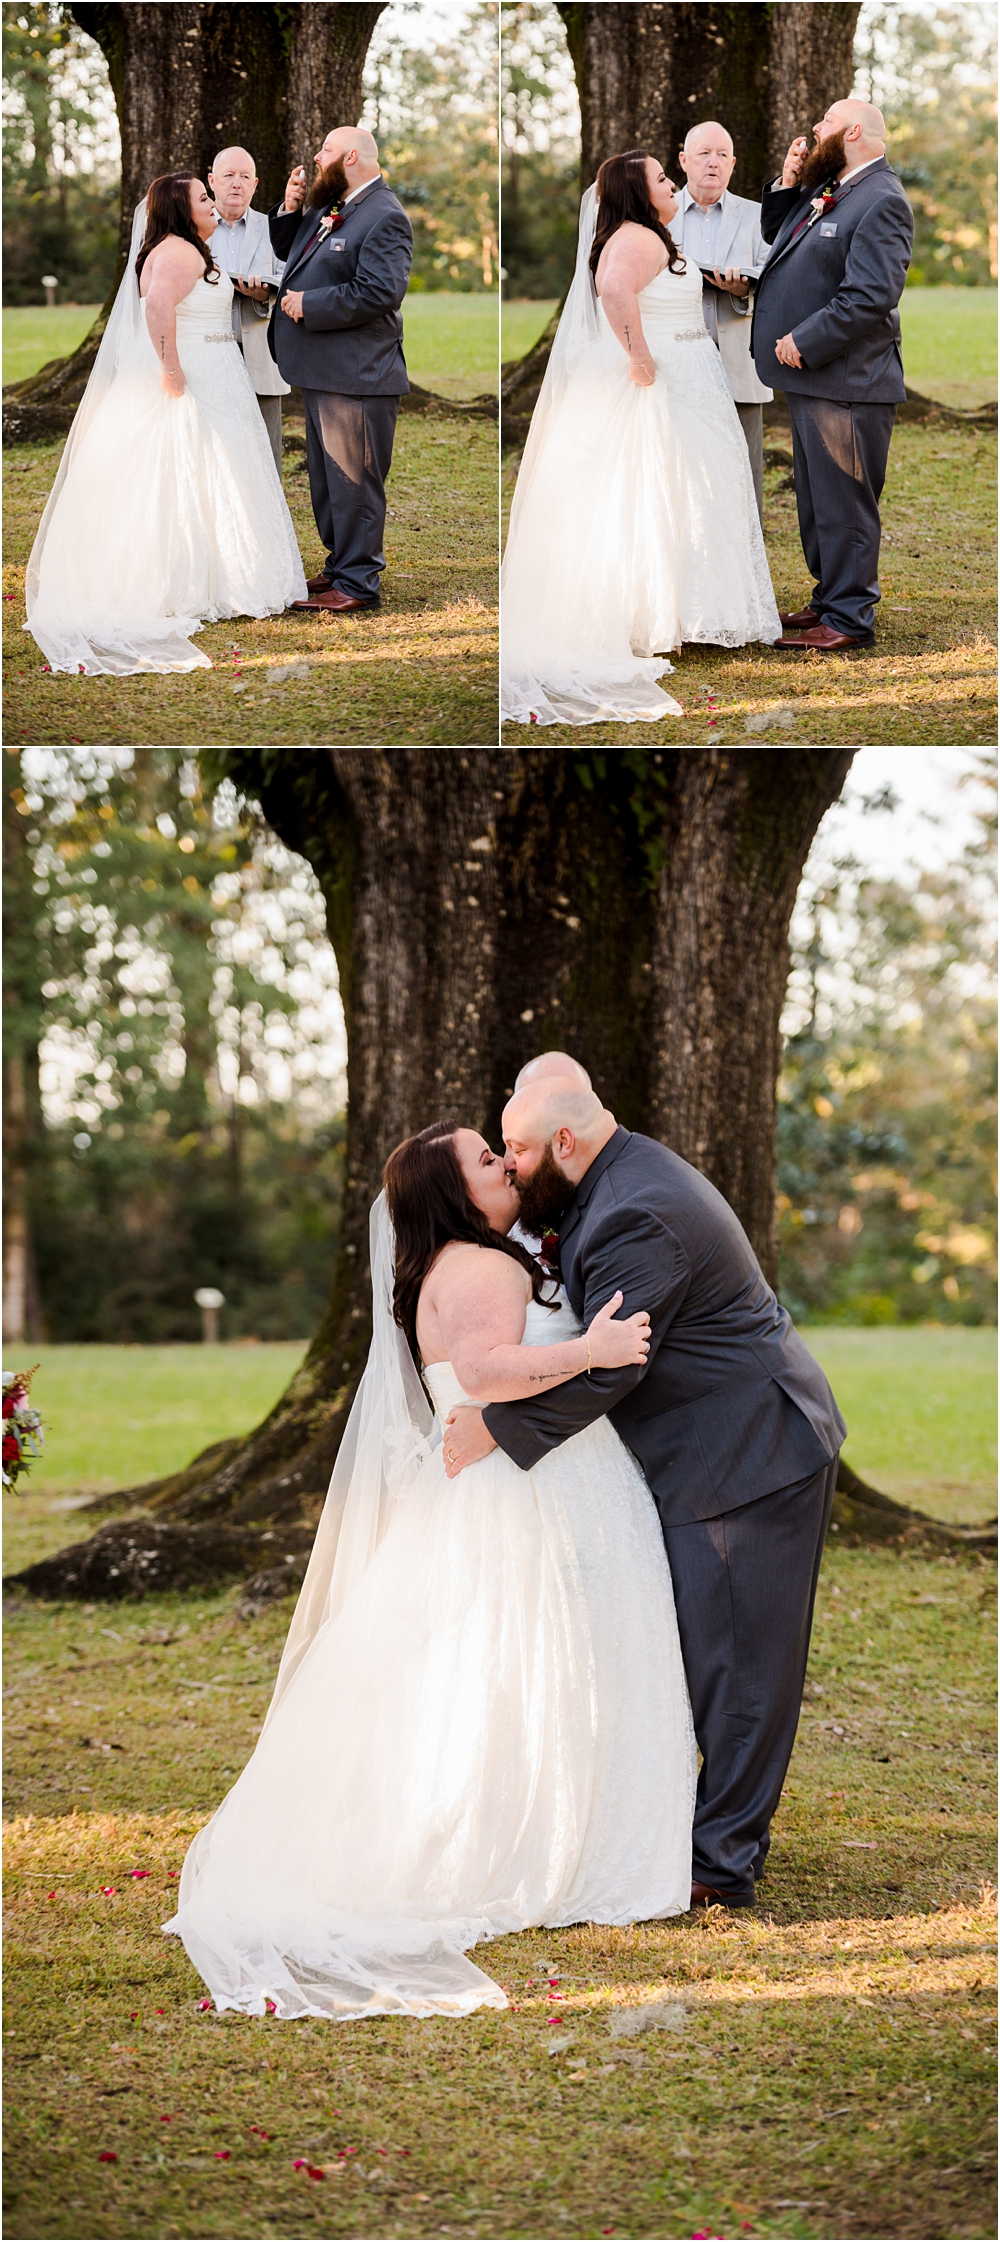 Eden-Gardens-florida-wedding-photographer-kiersten-stevenson-photography-66.jpg